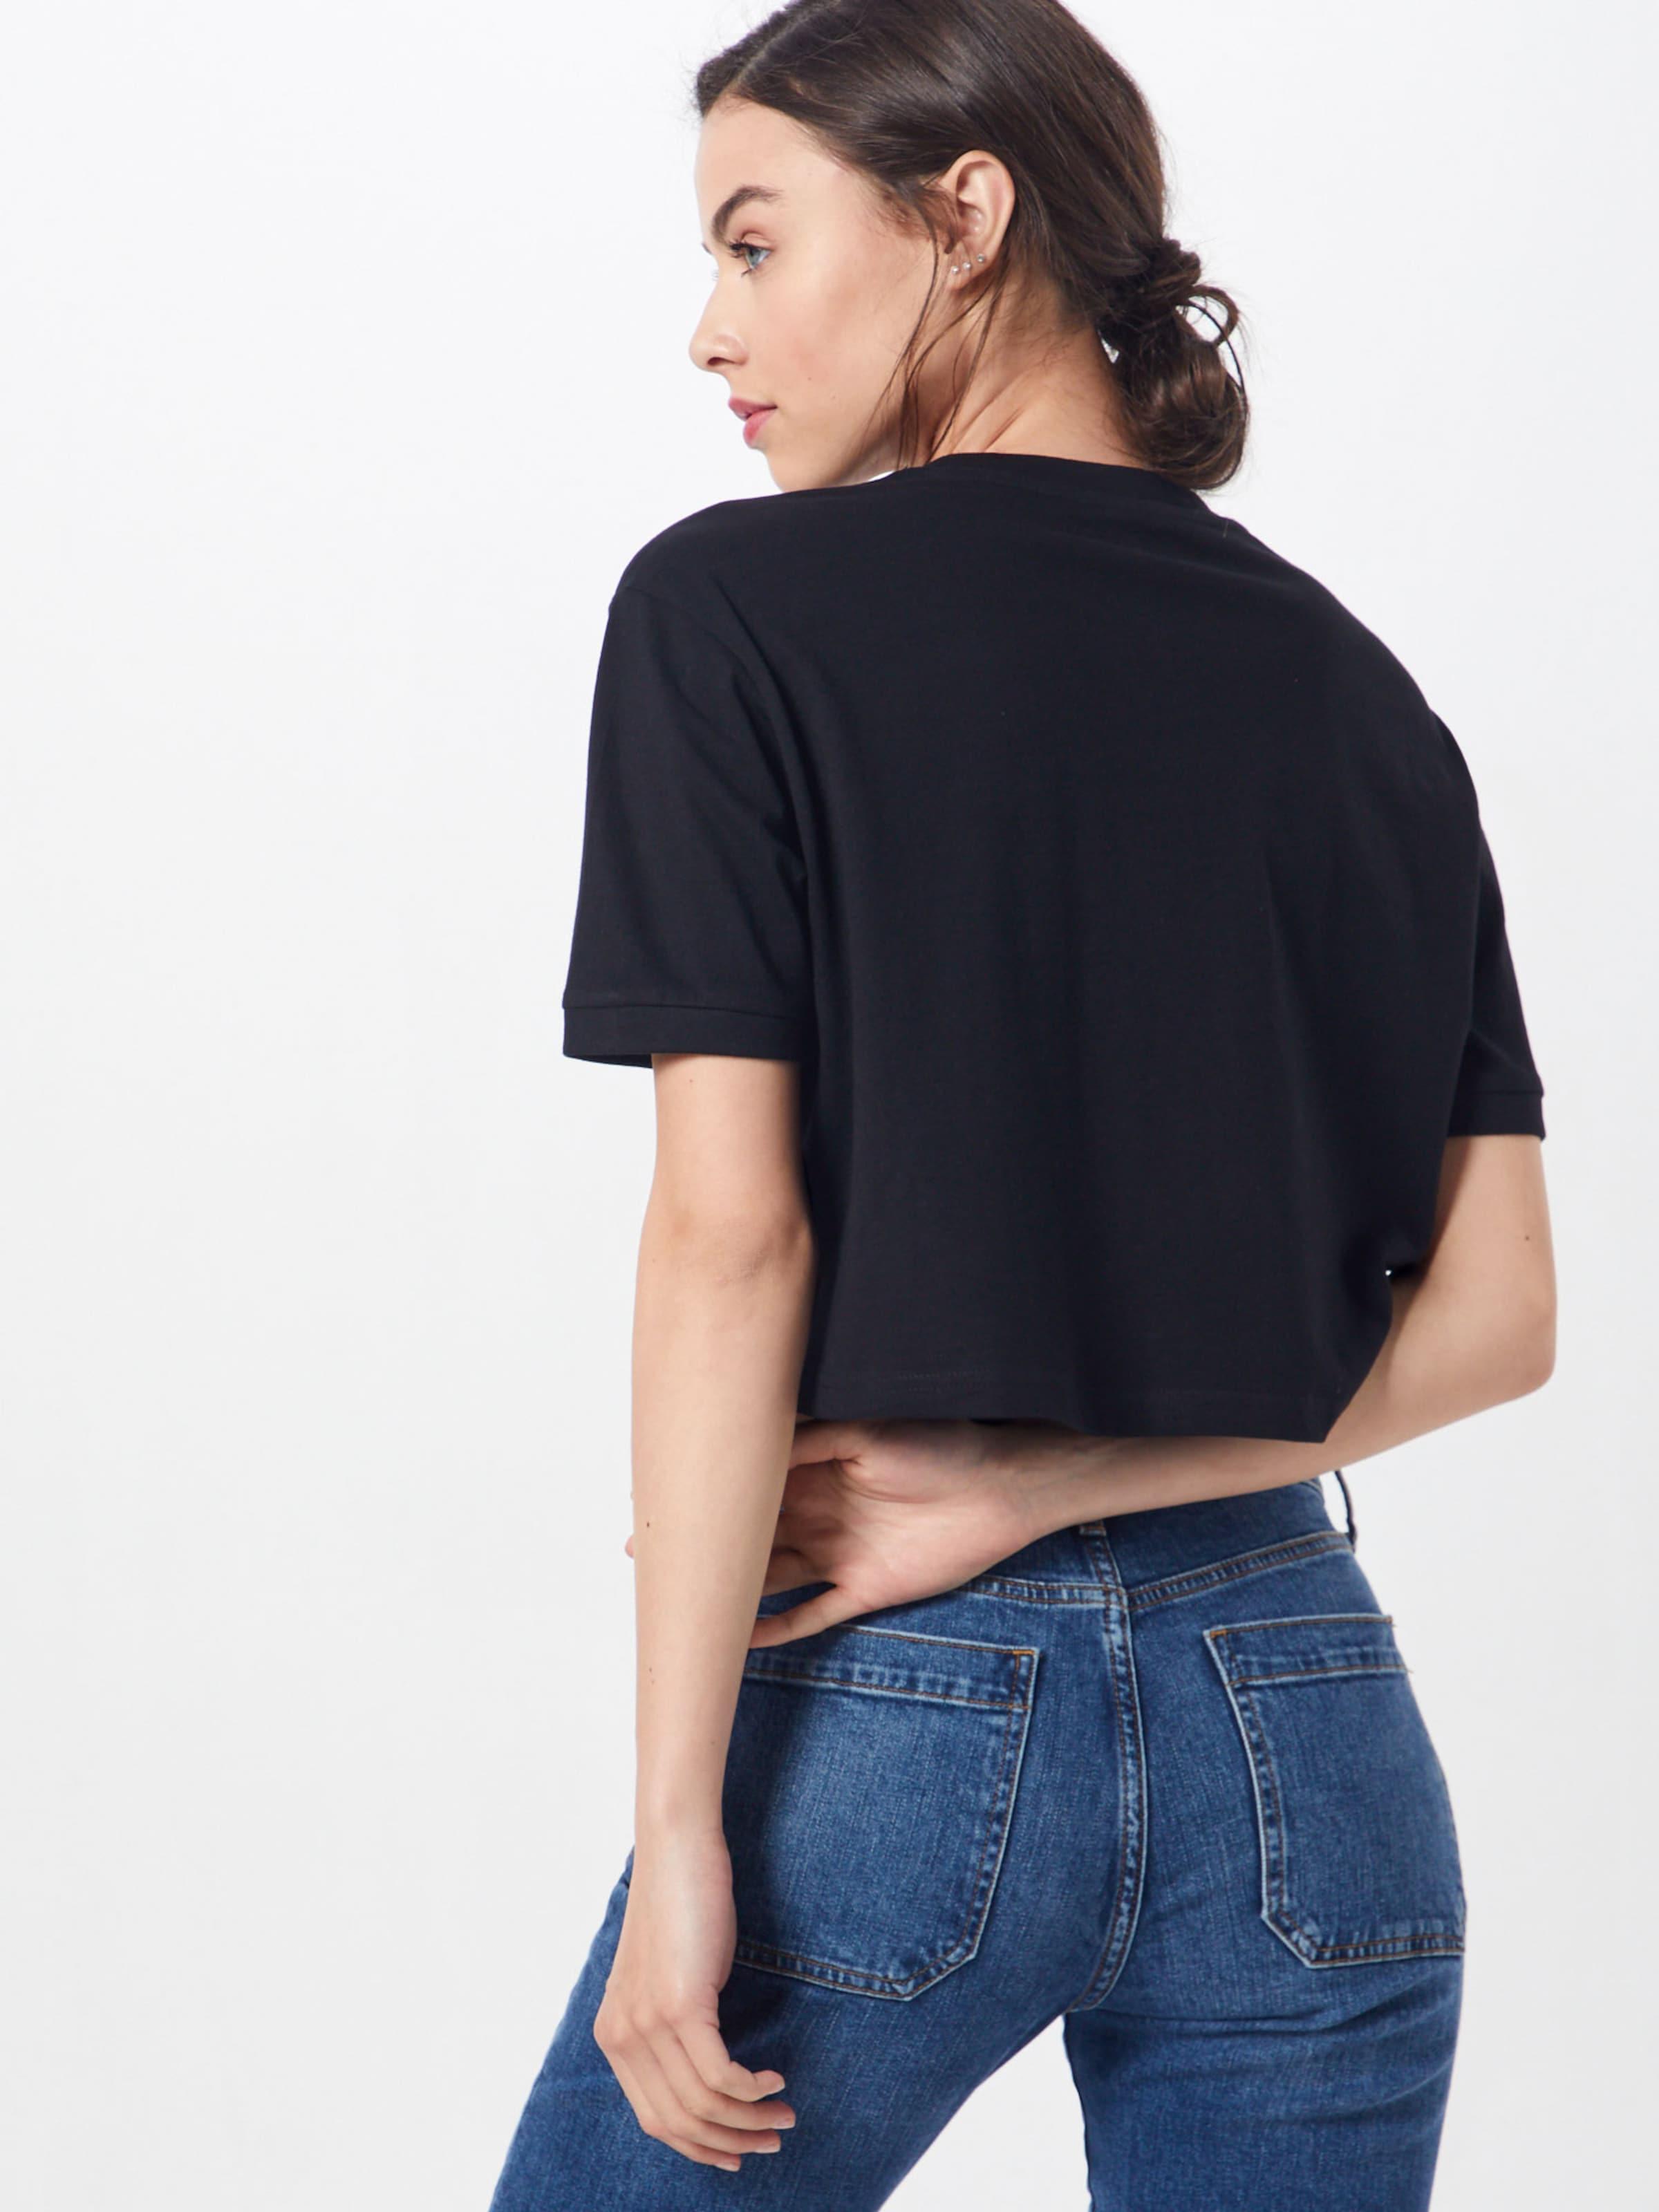 Jaune Classics T En Urban shirt 1cFKJlT